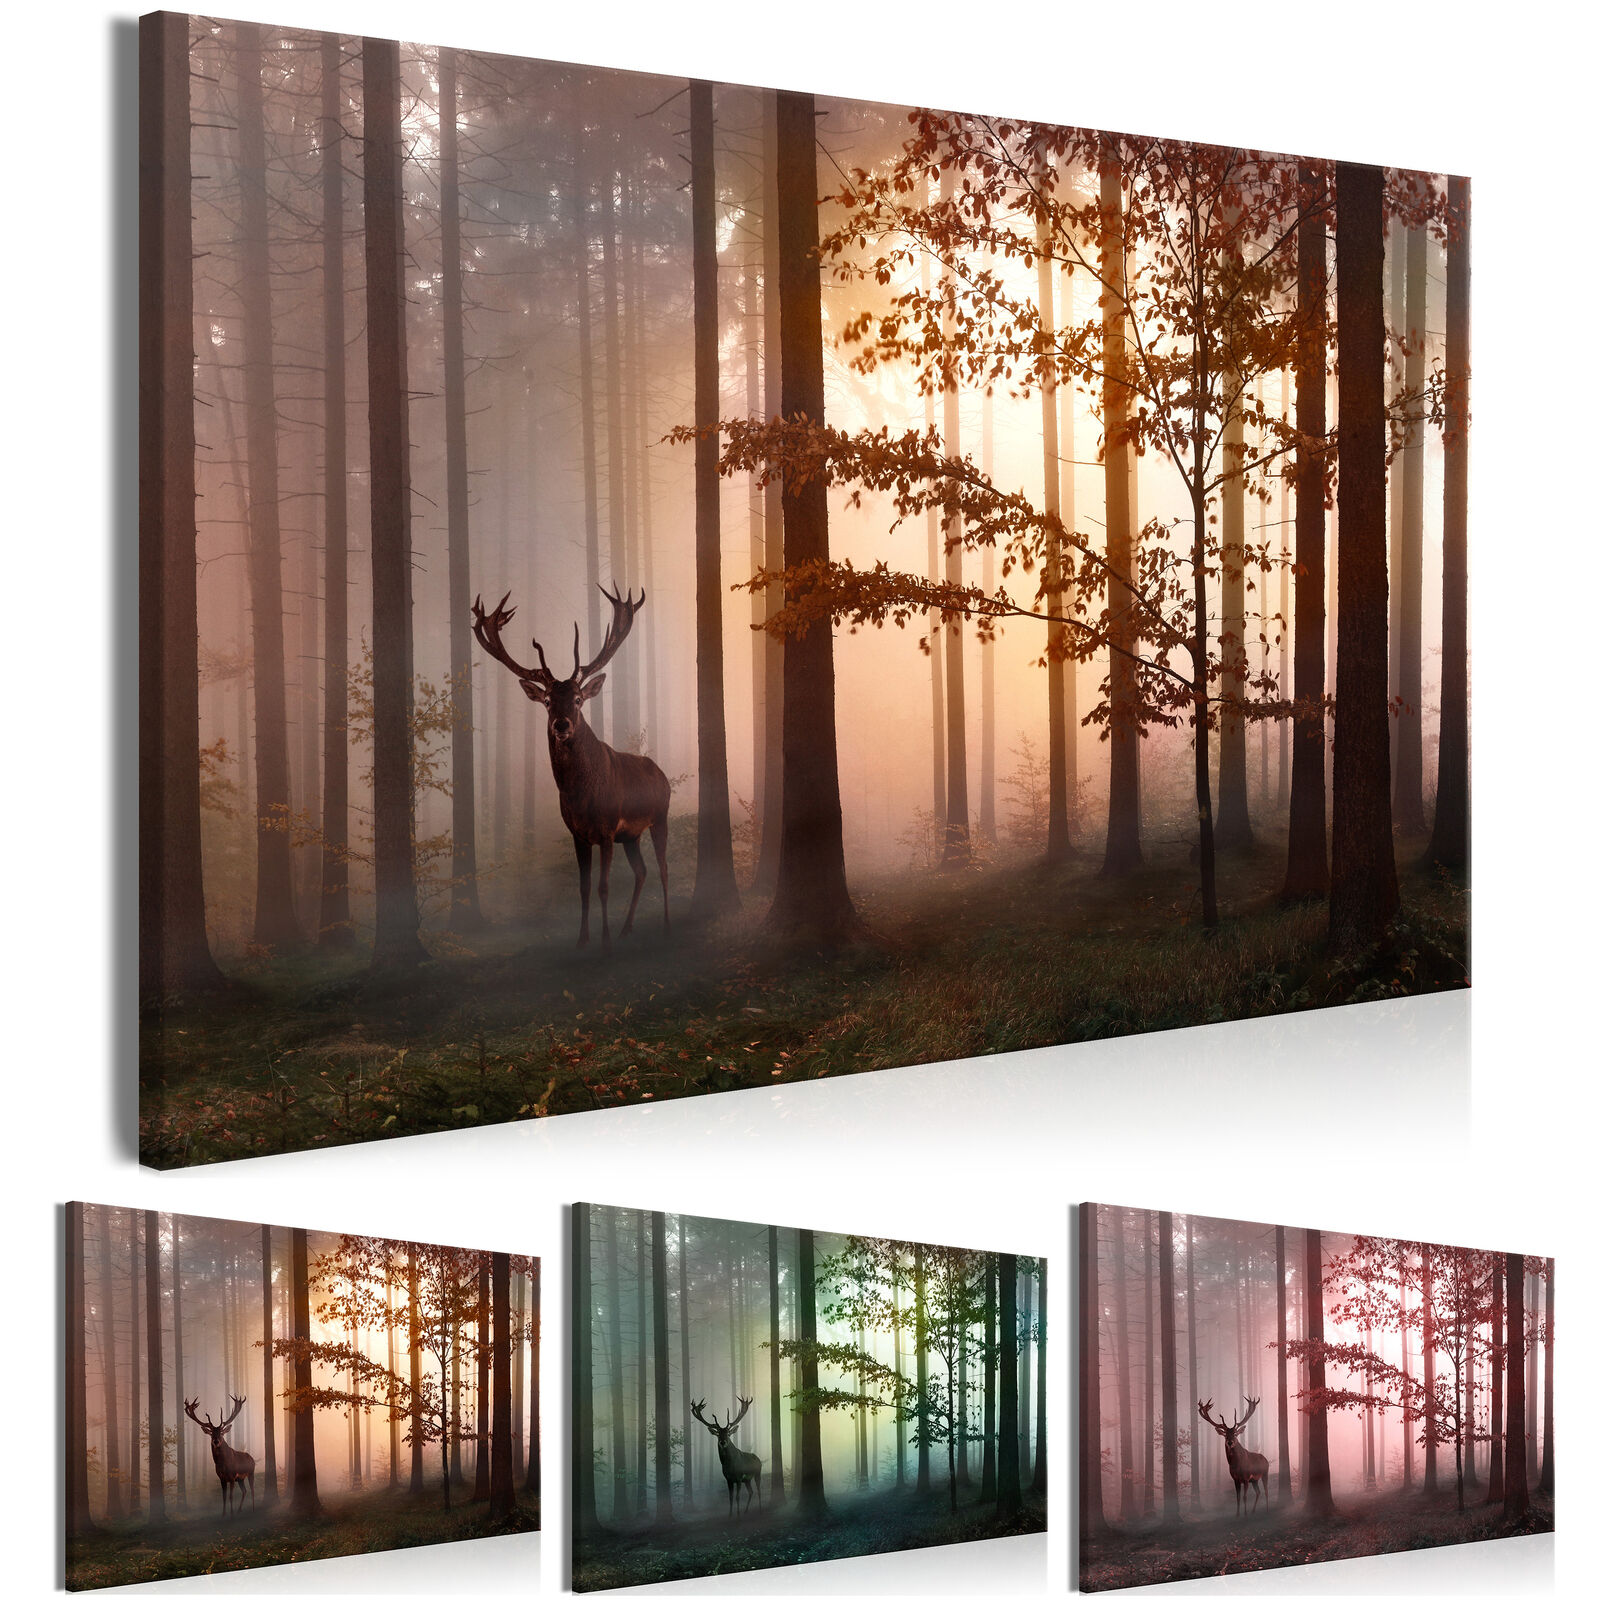 XXXL Wandbild 165x110cm Riesenformat Leinwandbild DIY Wald Canvas c-C-0235-ak-b